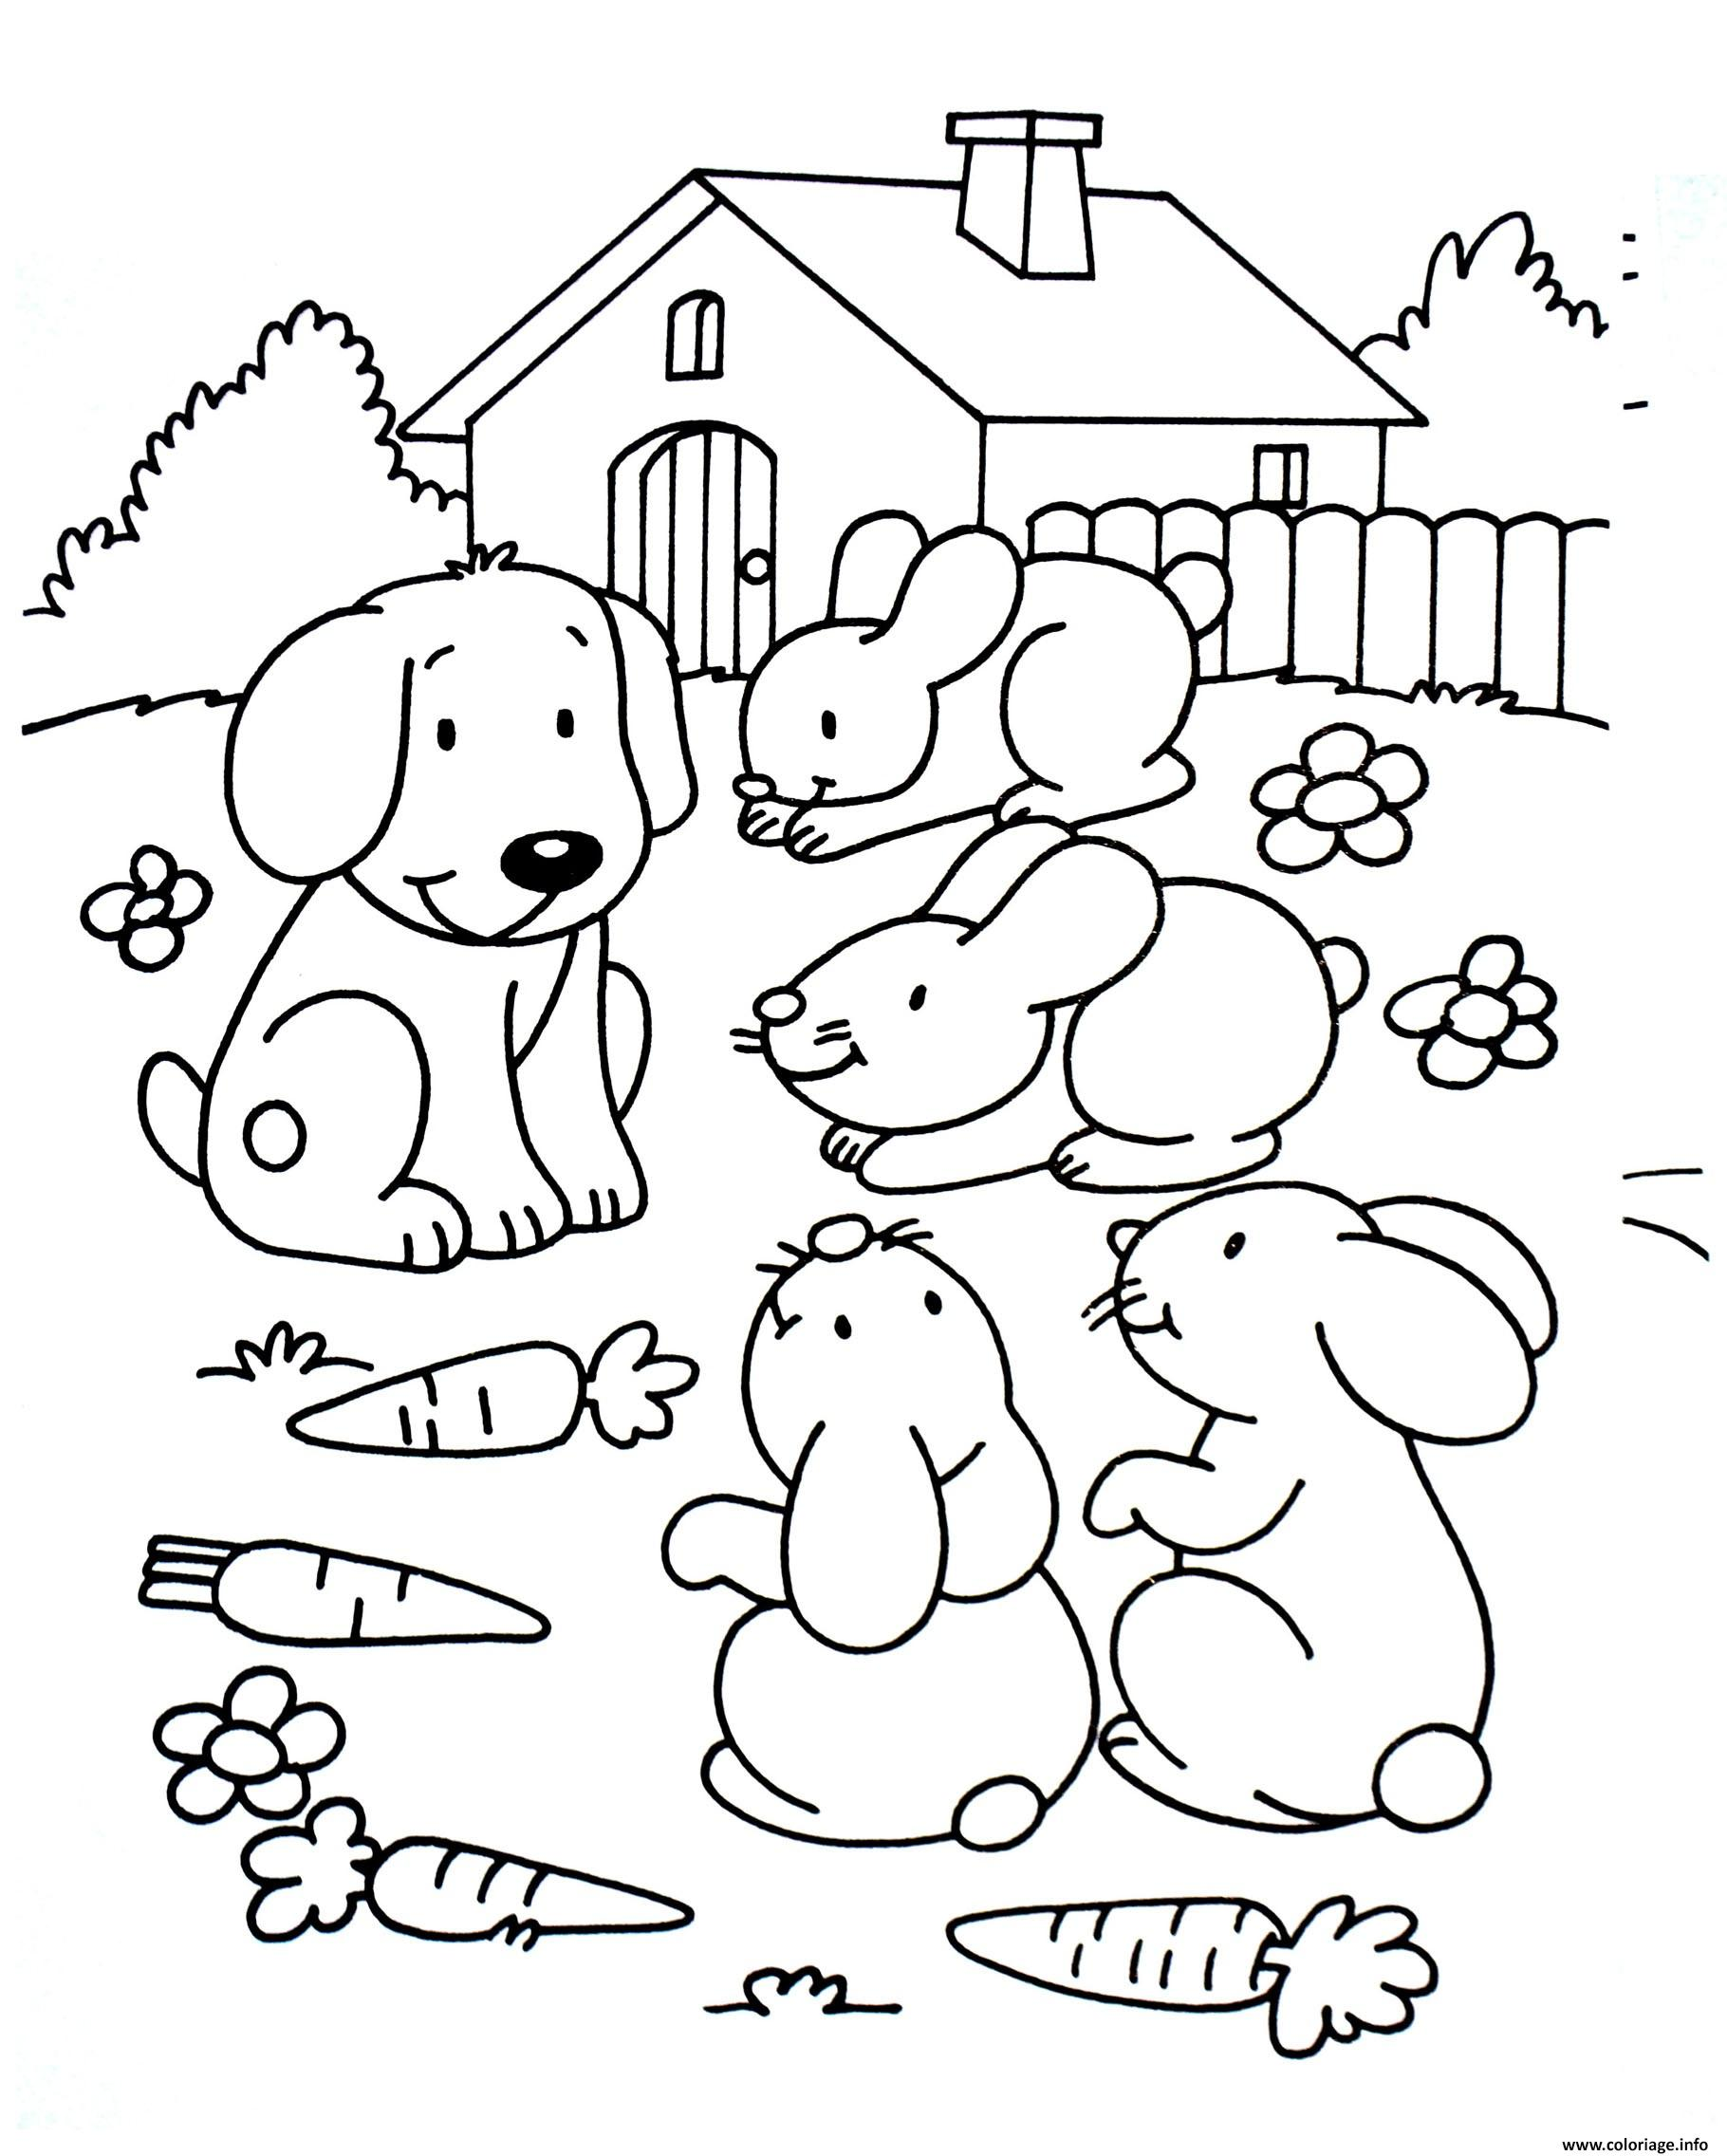 Coloriage lapins en compagnie du chien - Lapin en dessin ...